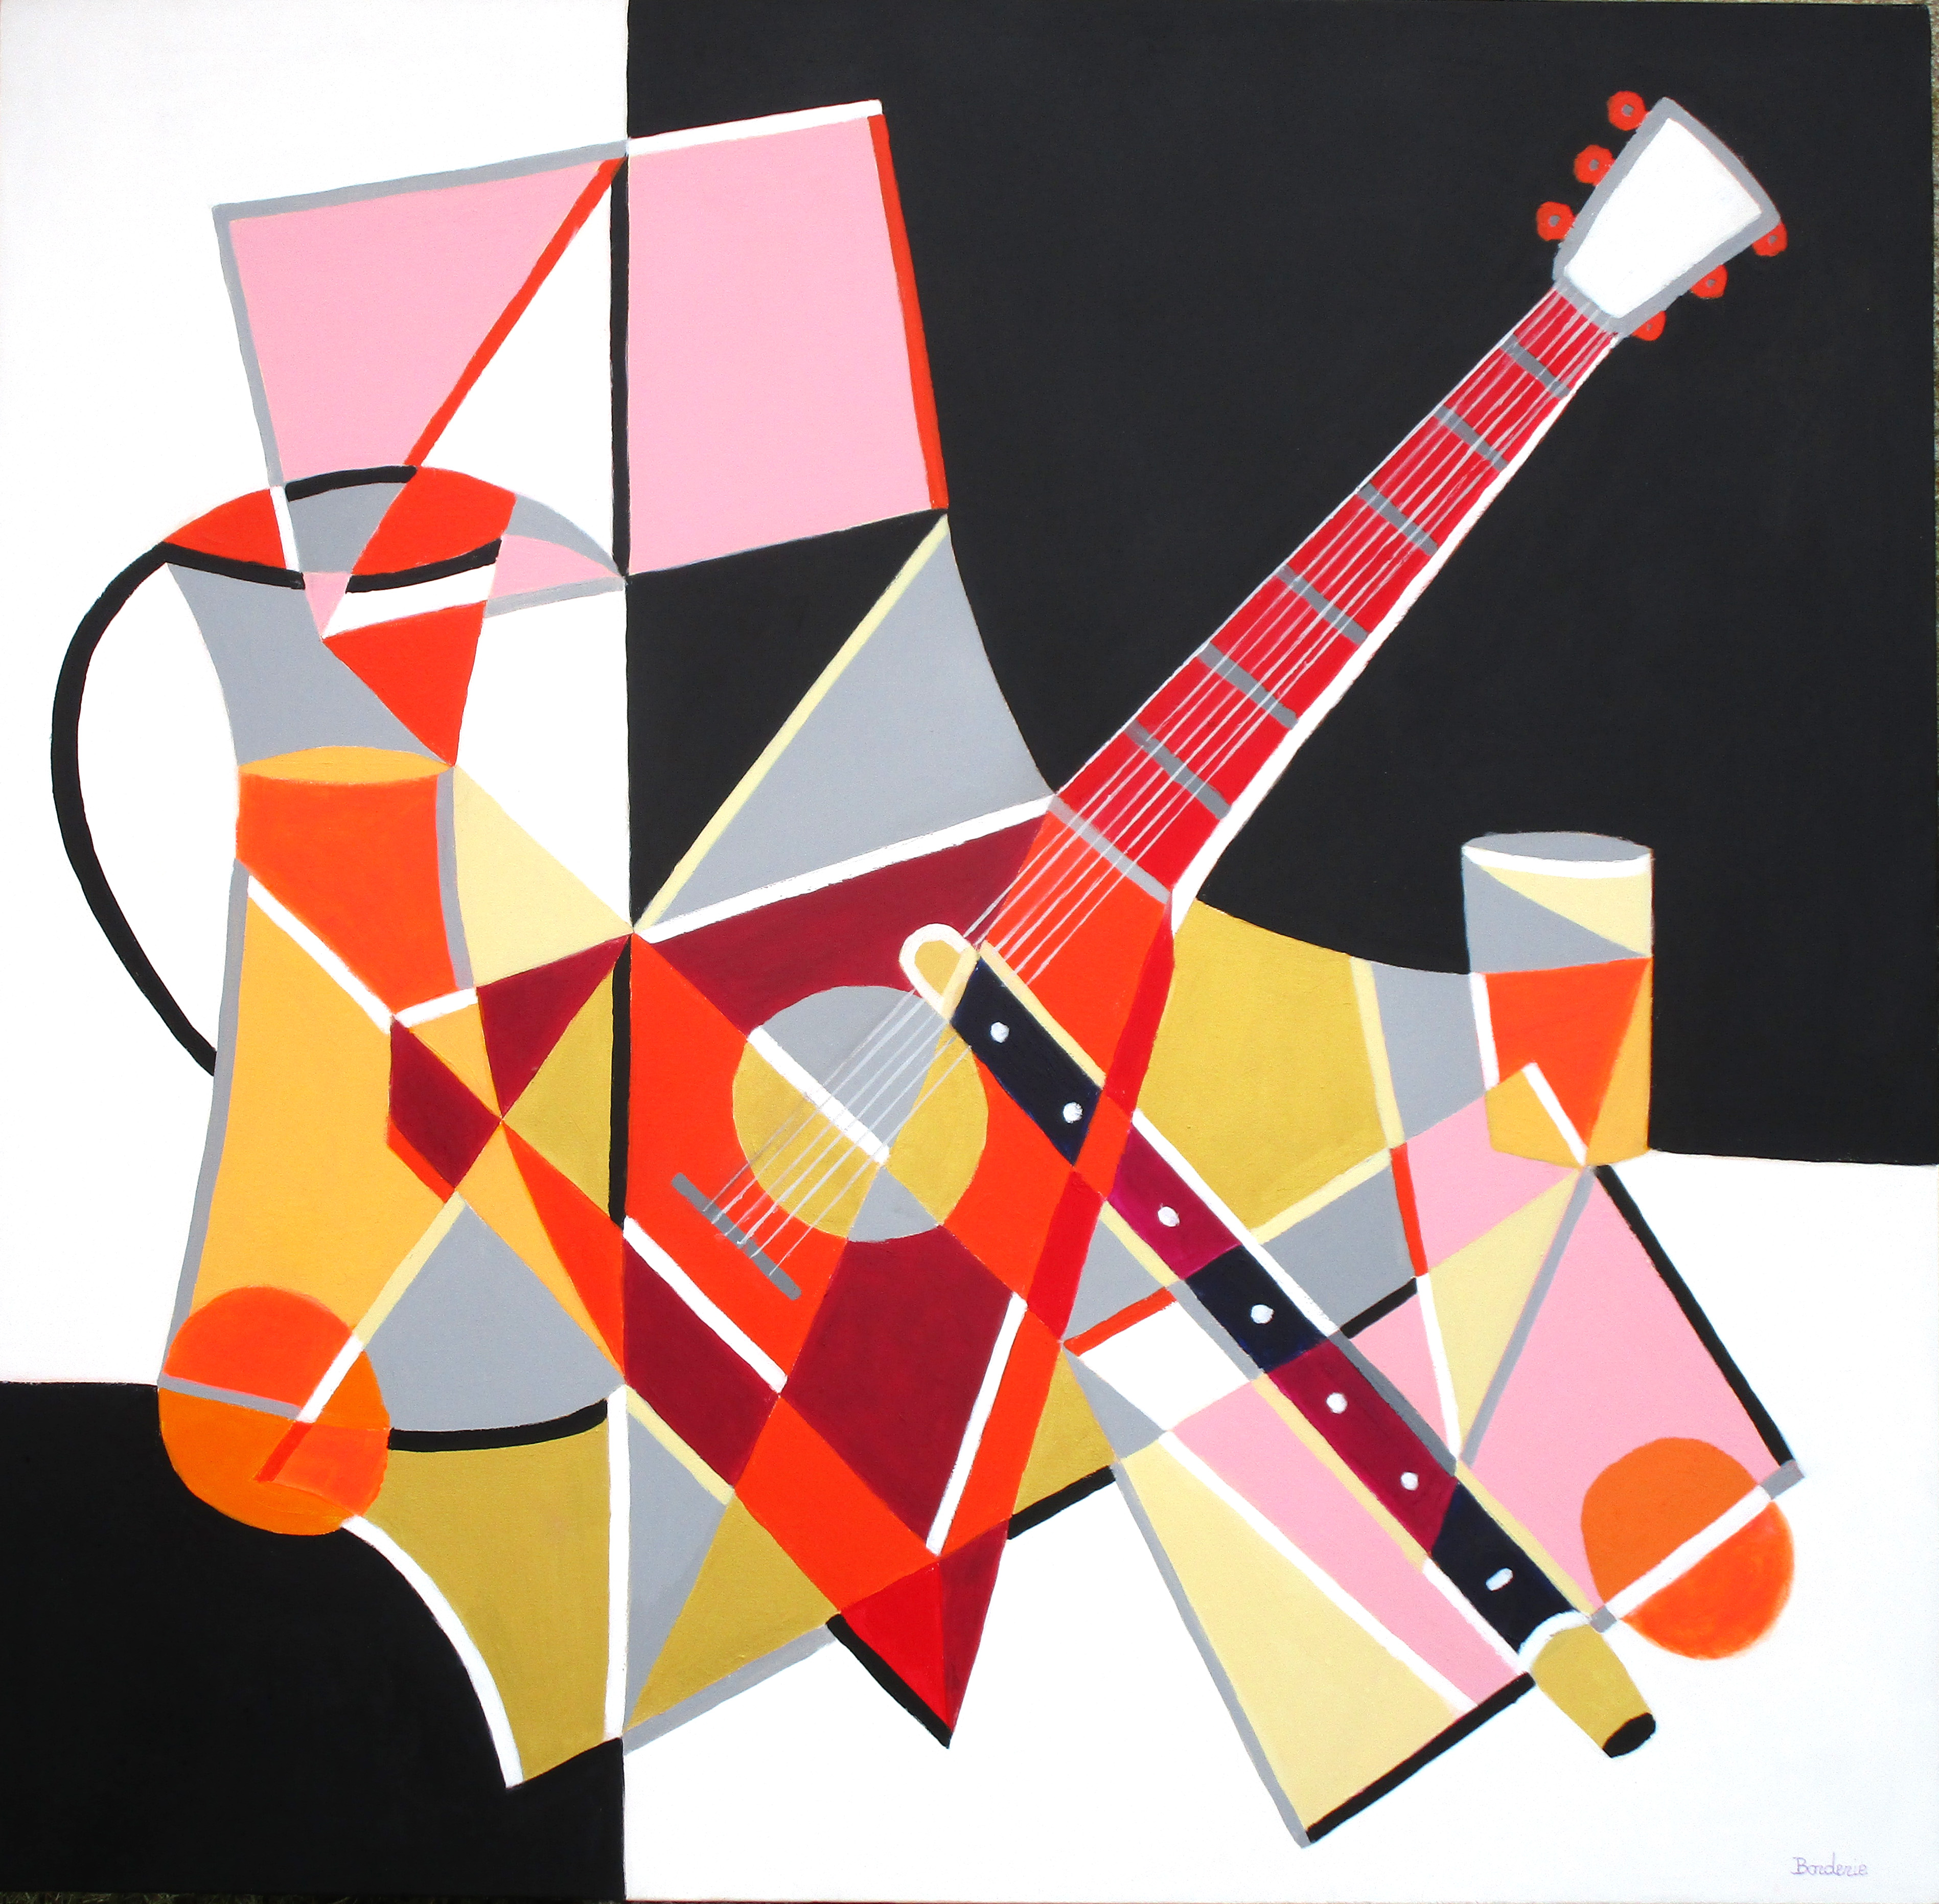 Mandoline, flûte et jus d'orange.